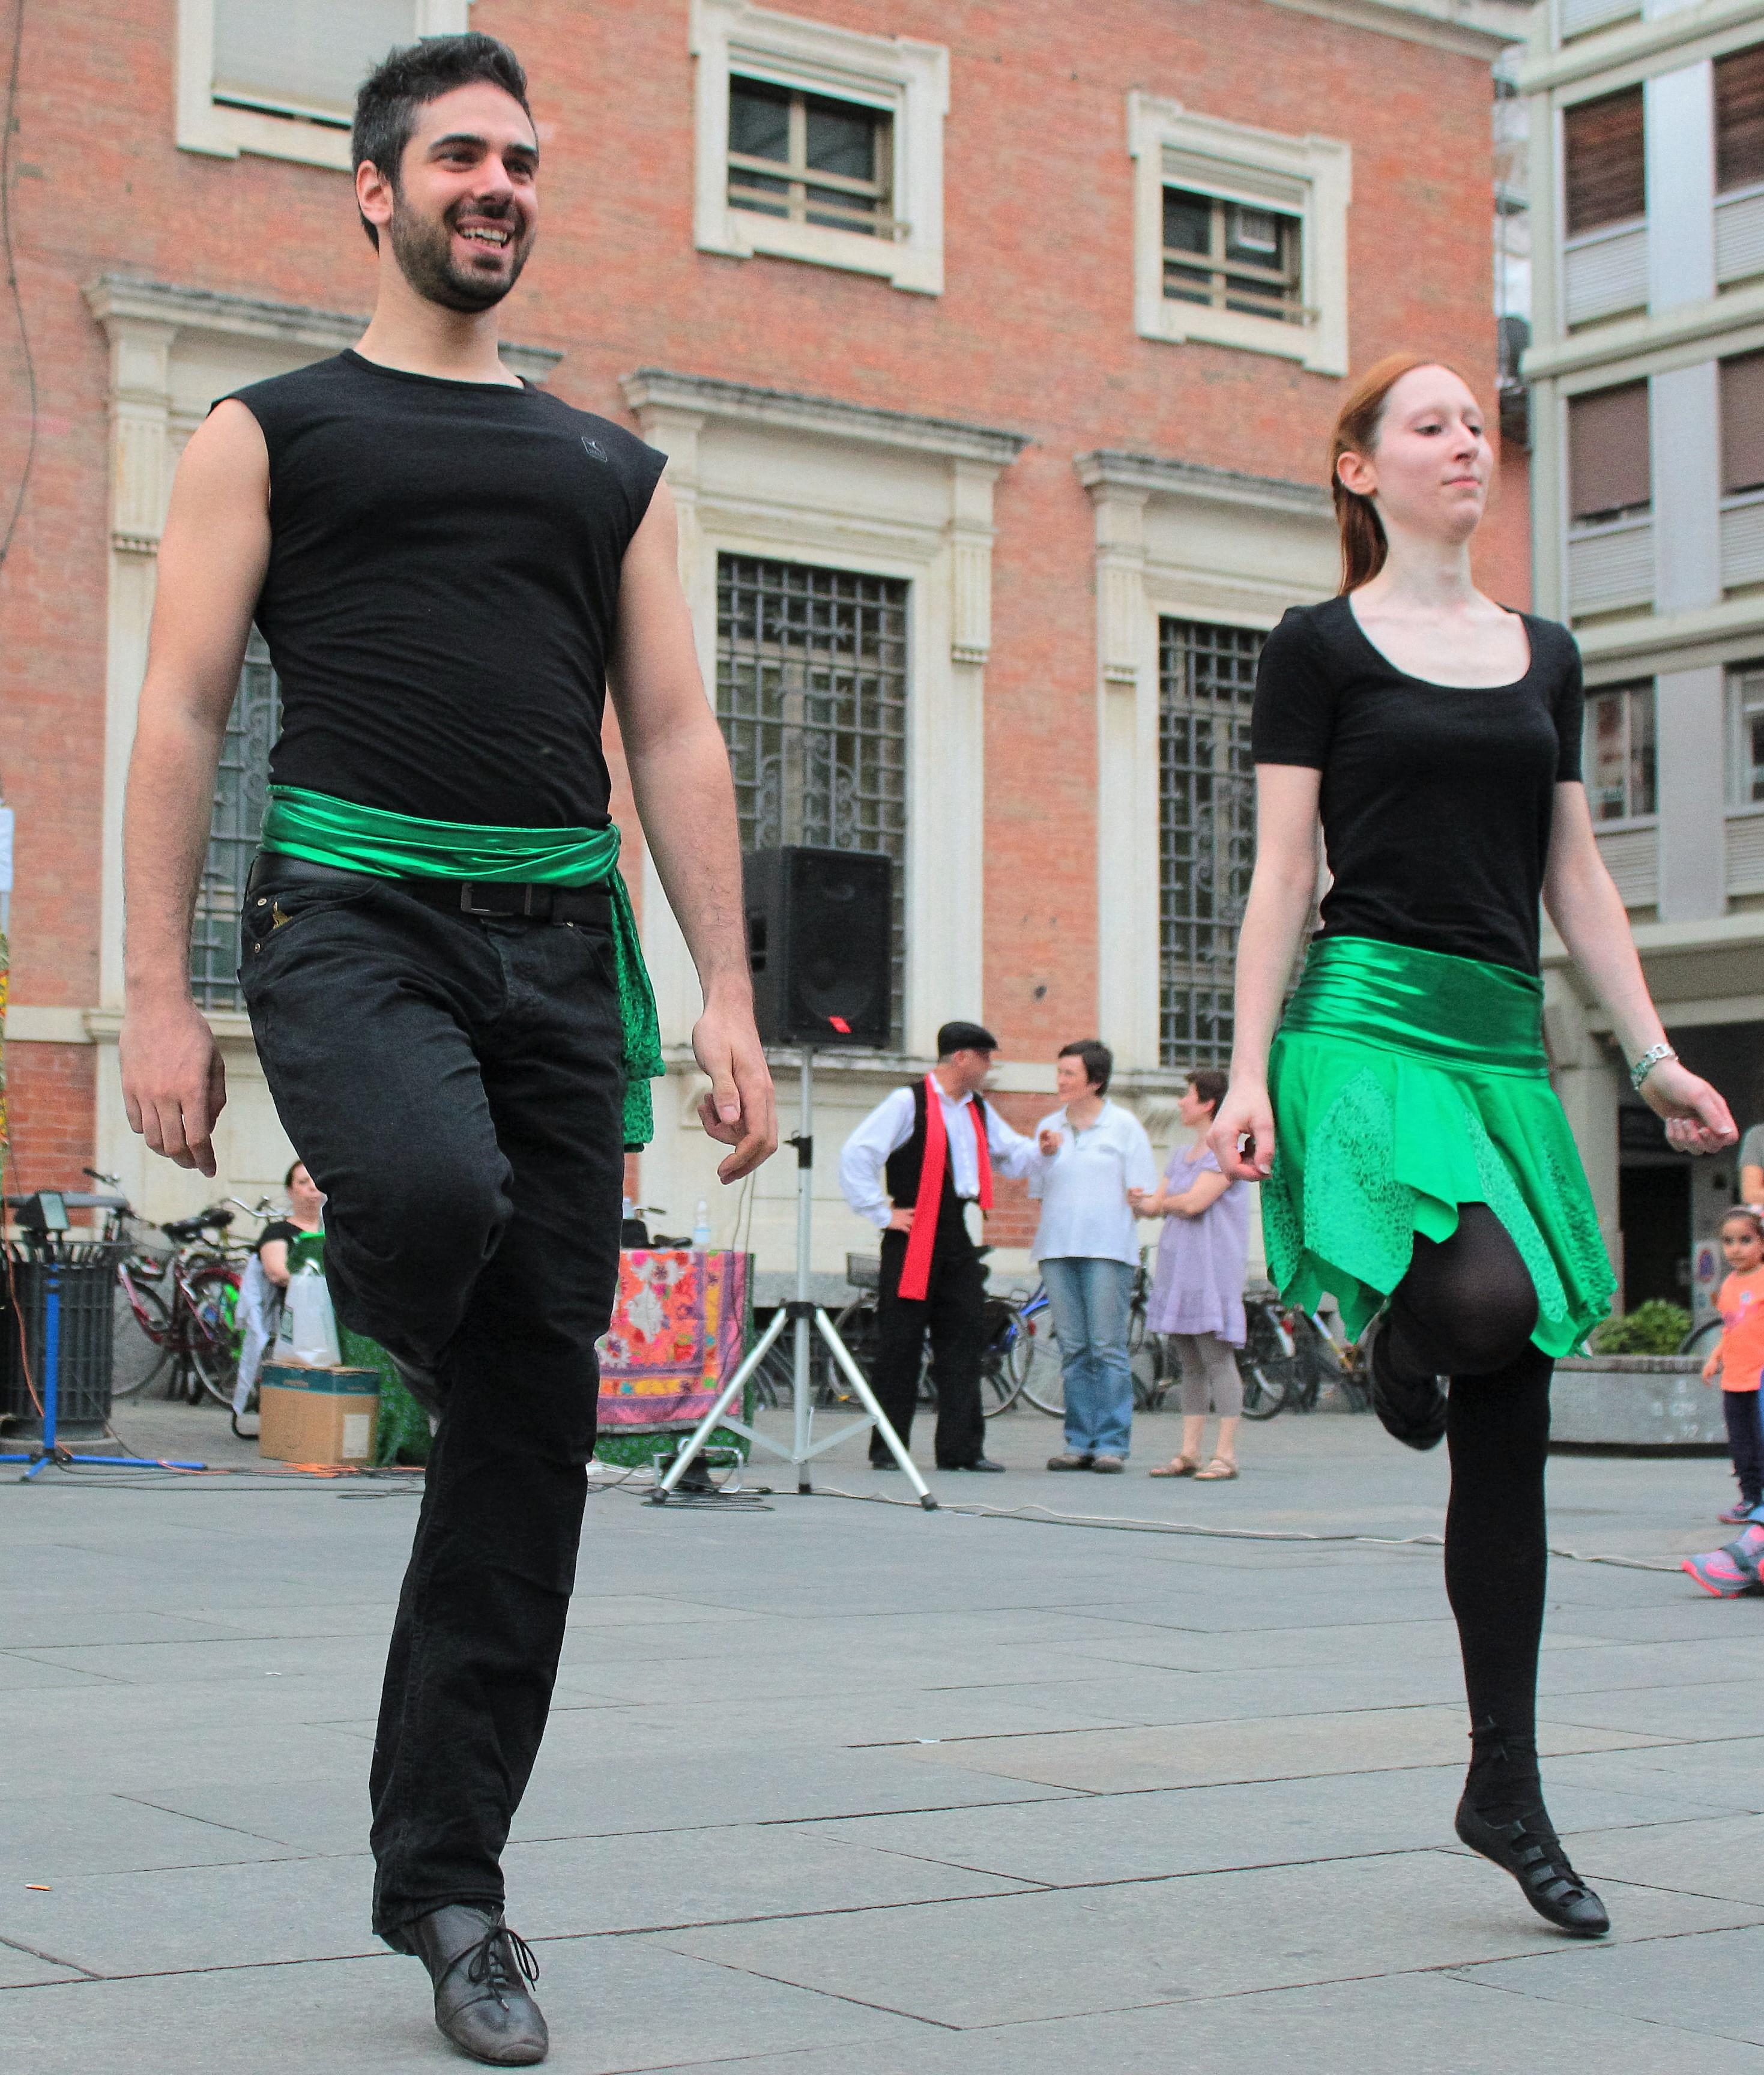 https://www.balliamosulmondo.net/corsi/danza-irlandese/